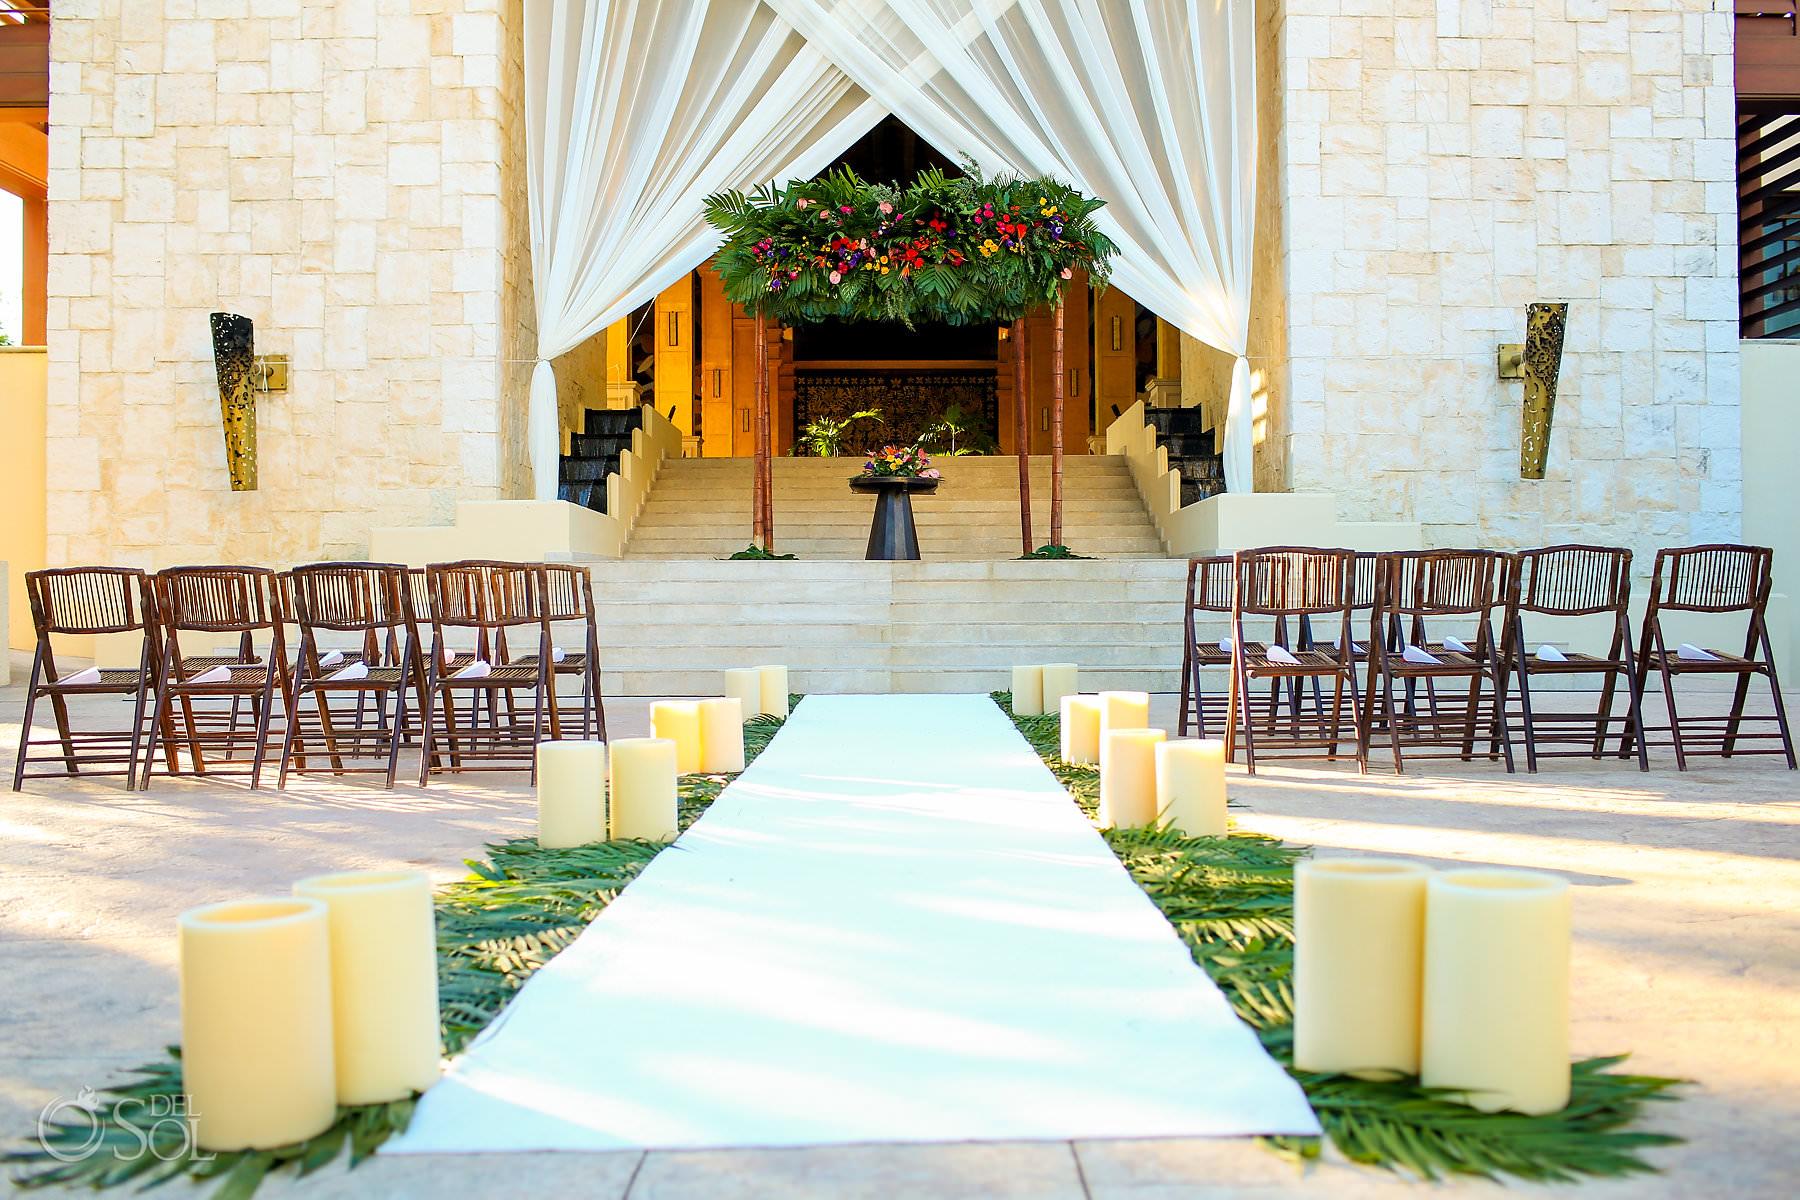 Grand Staircase Dreams Riviera Cancun Wedding ceremony setup